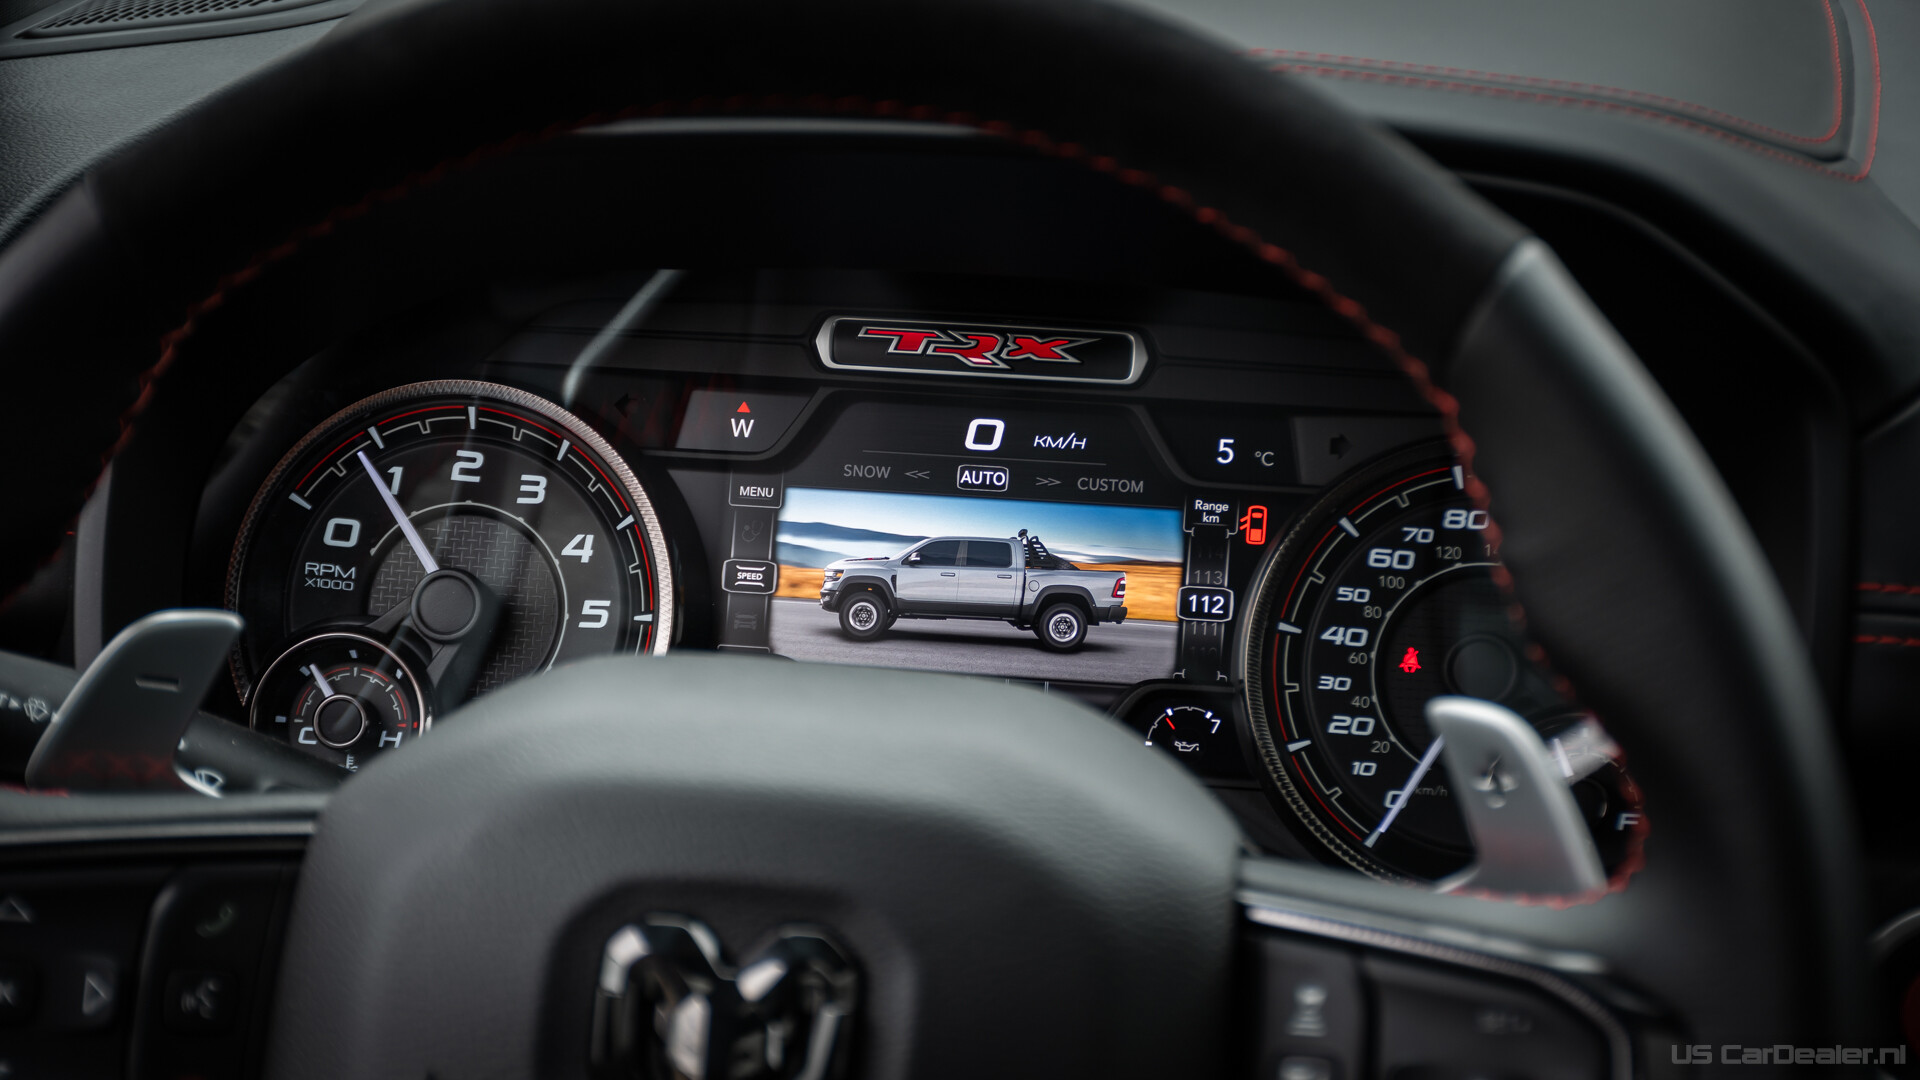 Driving mode selector